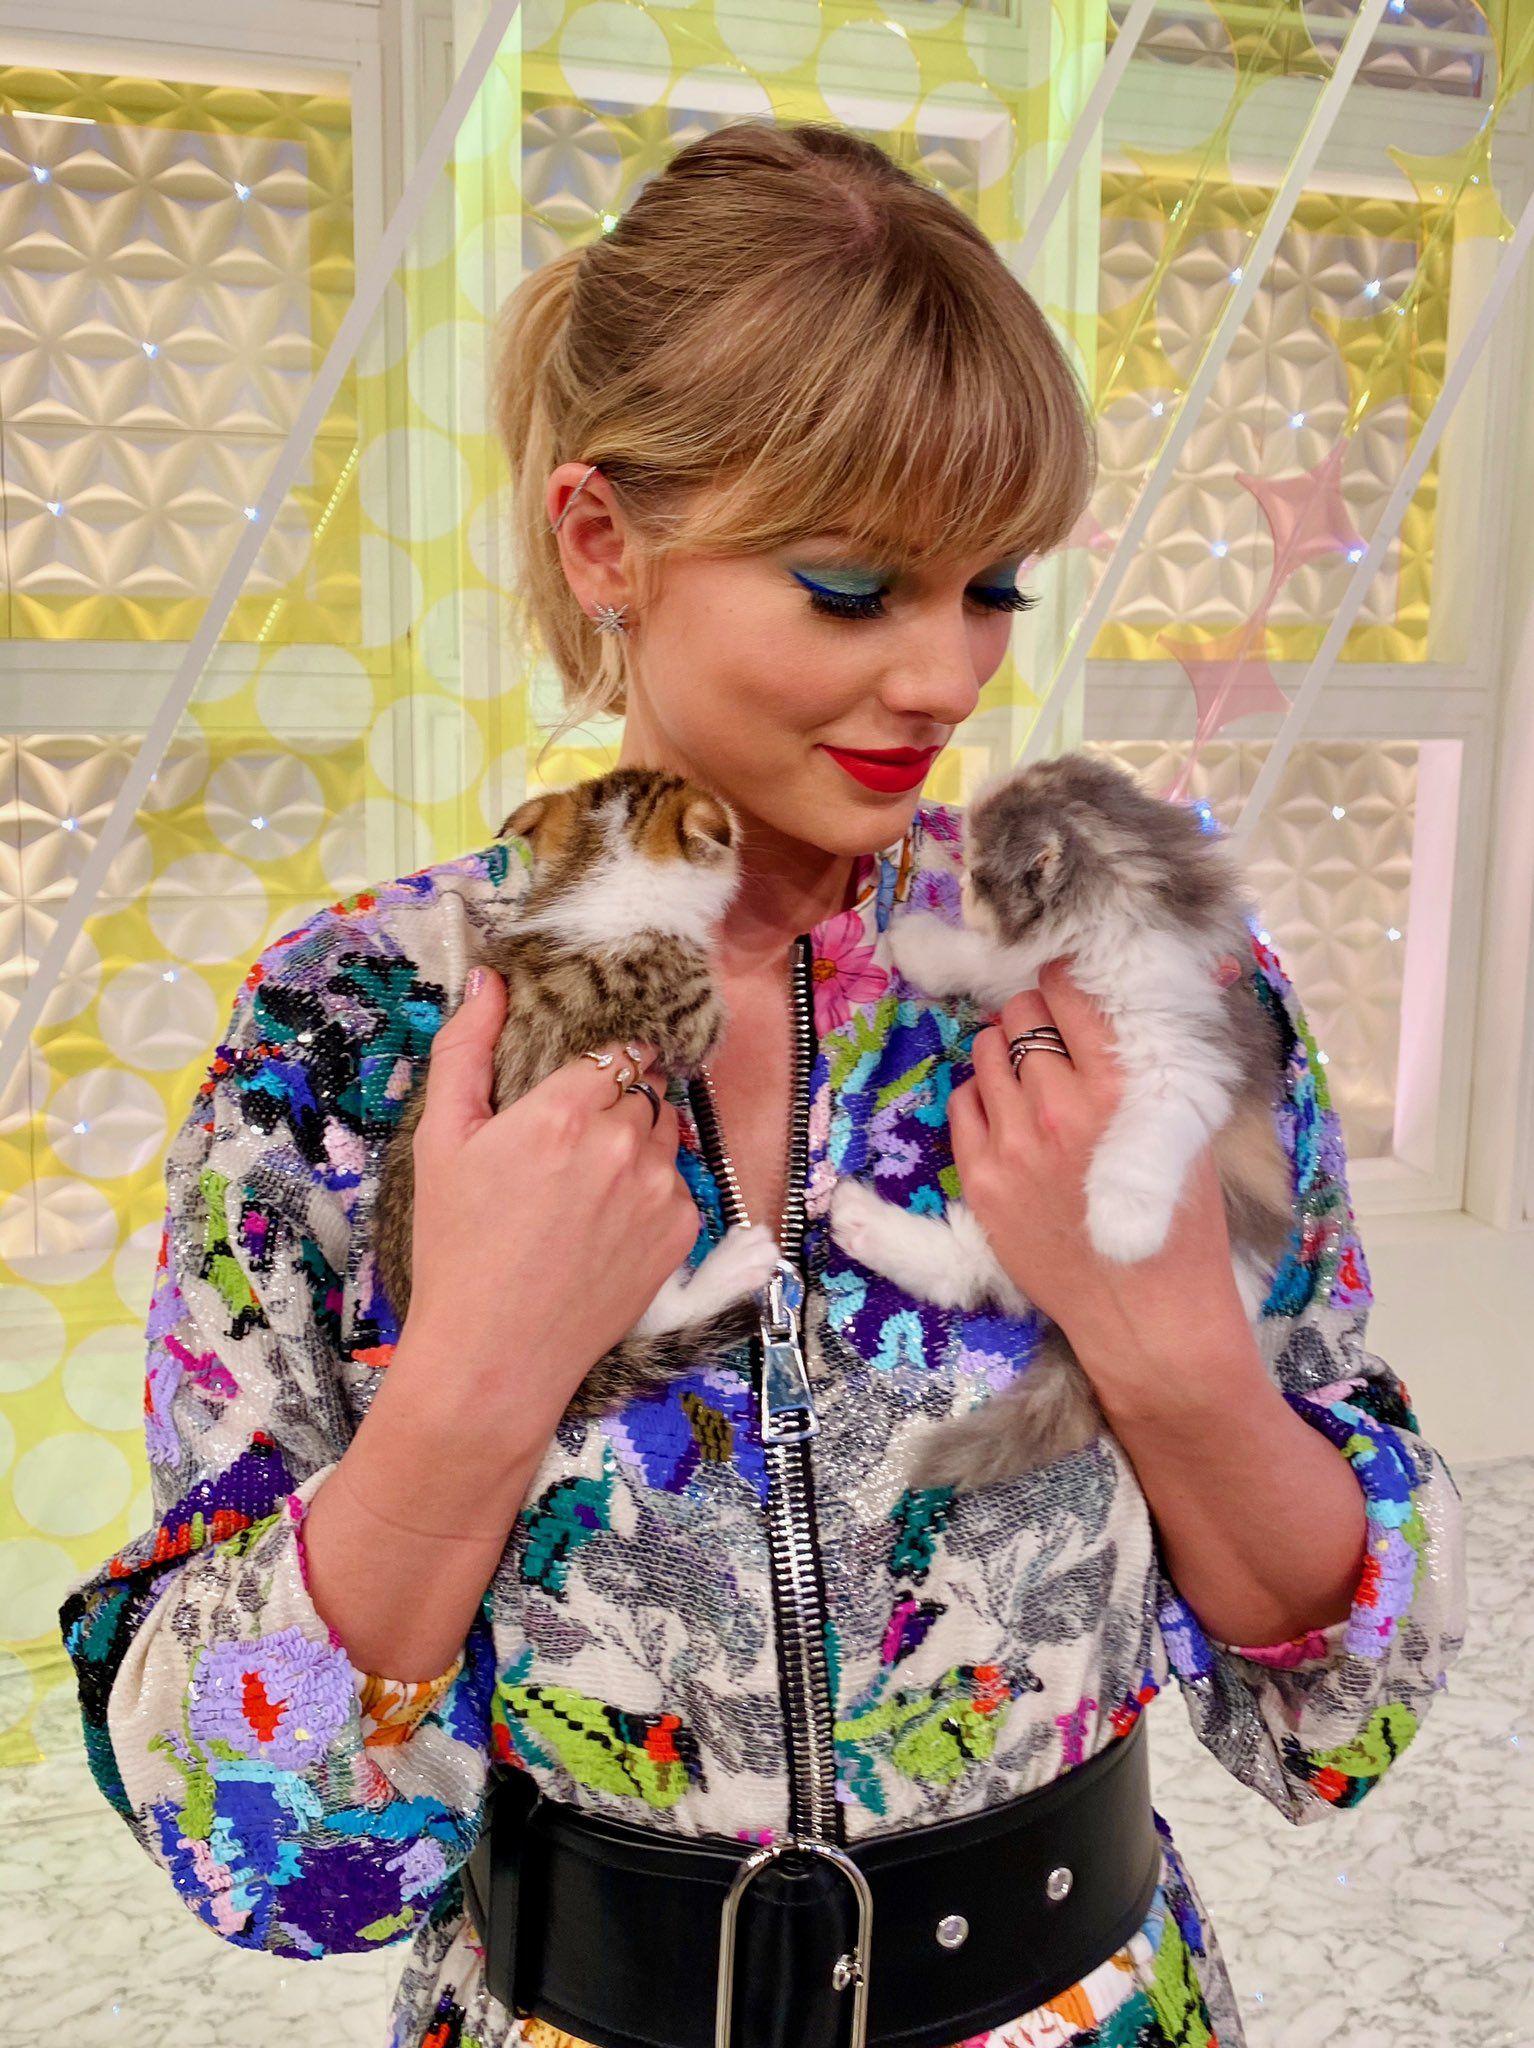 Taylor Swift on Twitter in 2020 Taylor swift cat, Taylor